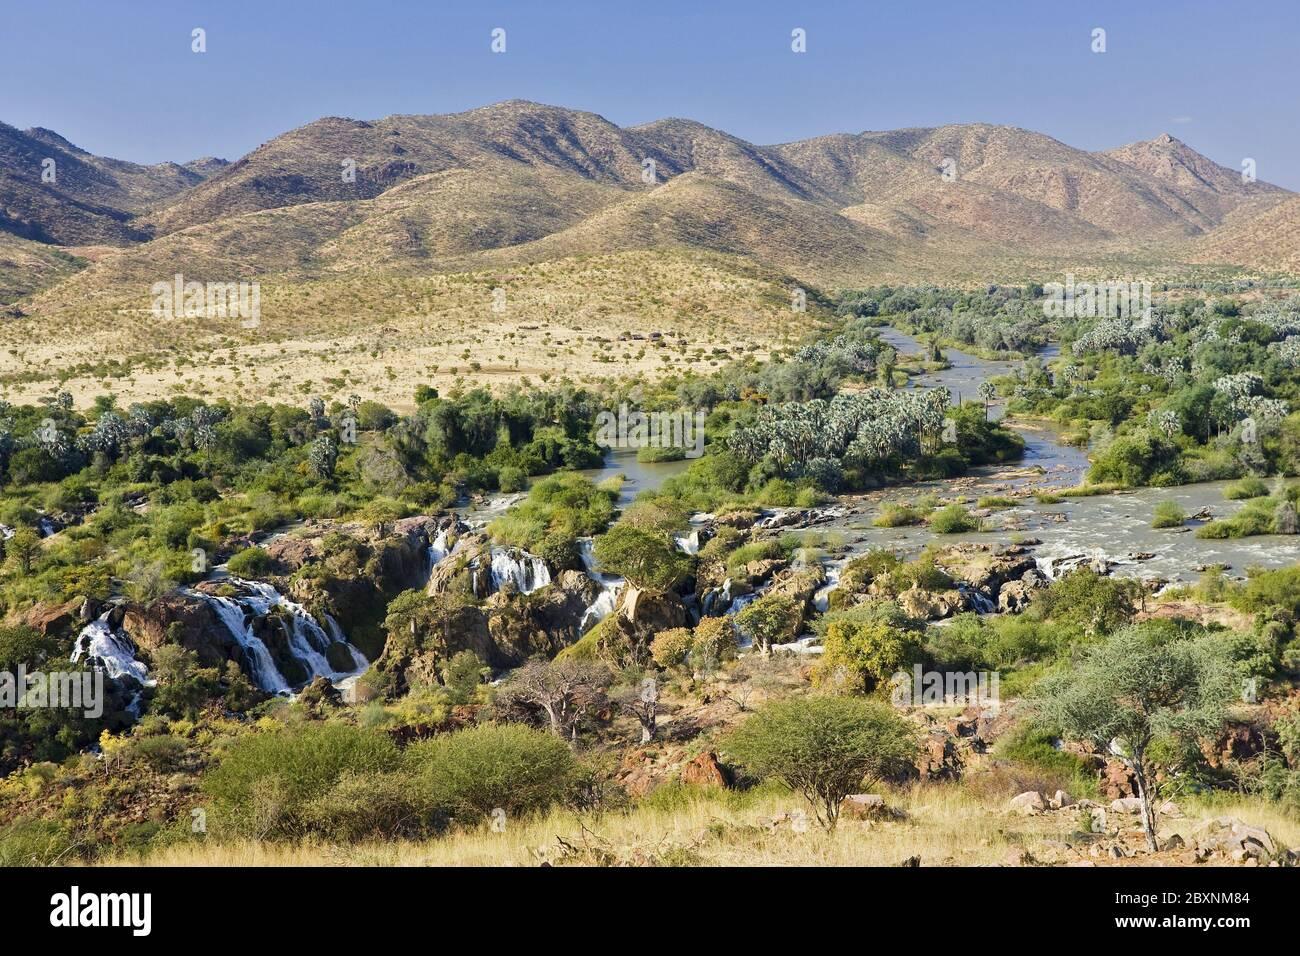 Kunene River, Kaokoveld, Namibie, Afrika, Epupa Falls, Afrique Banque D'Images